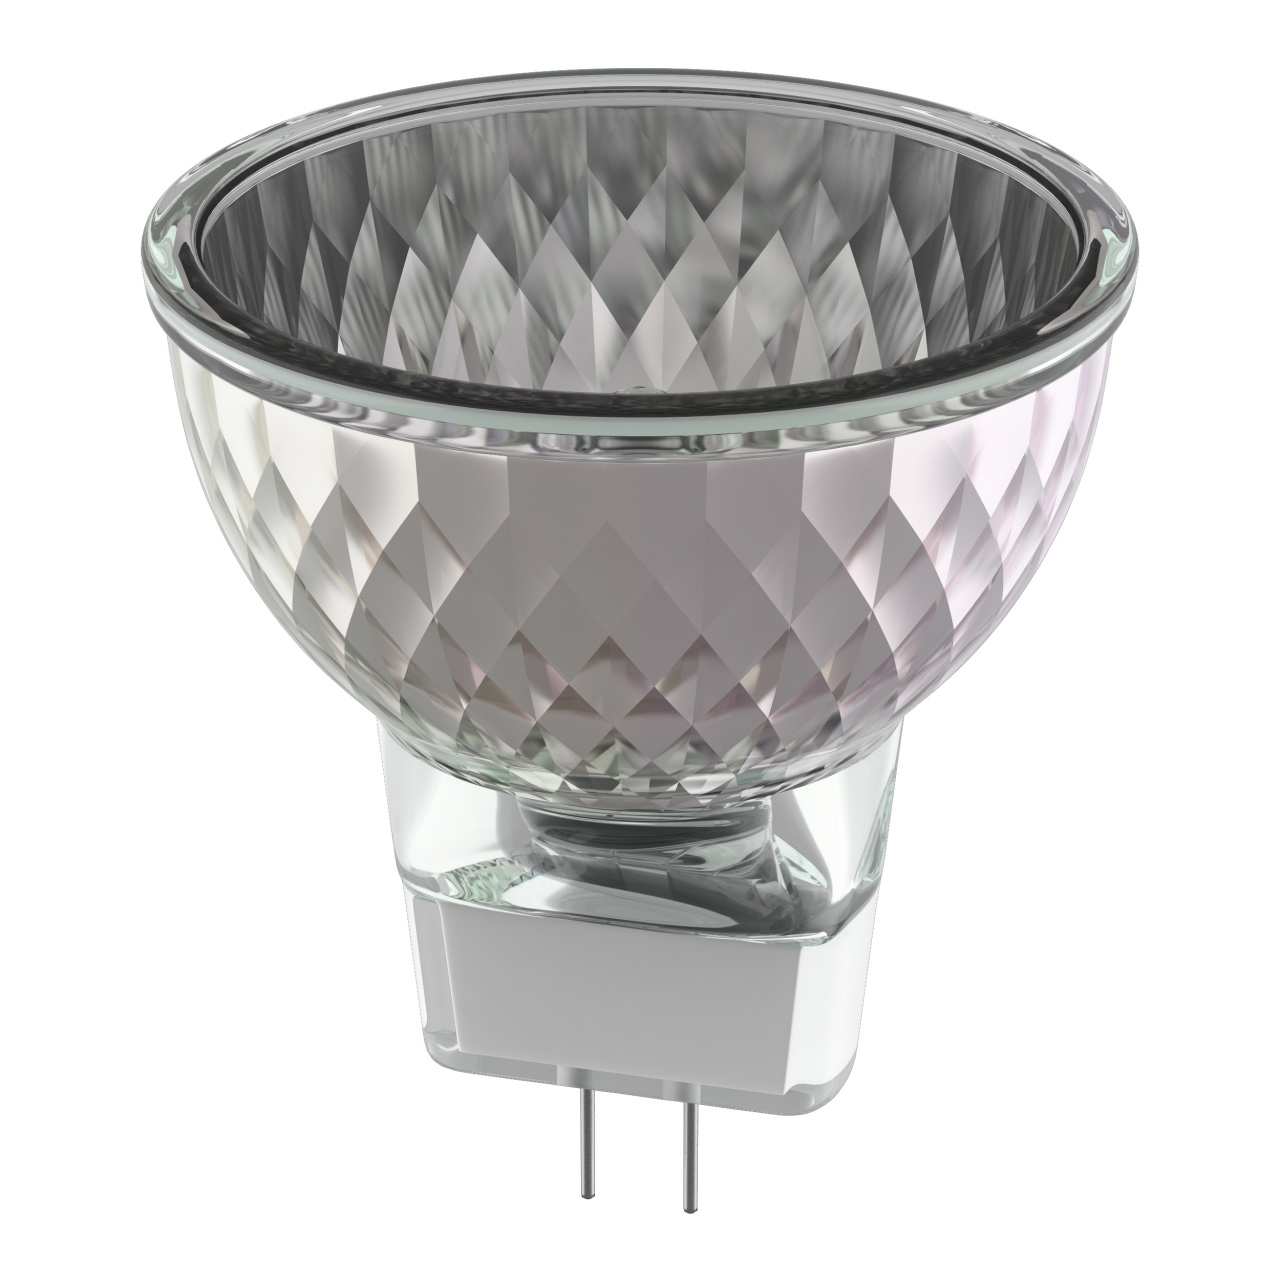 Лампа HAL 12V MR11 G4 50W 30G RA100 2800K 2000H DIMM Lightstar 921006